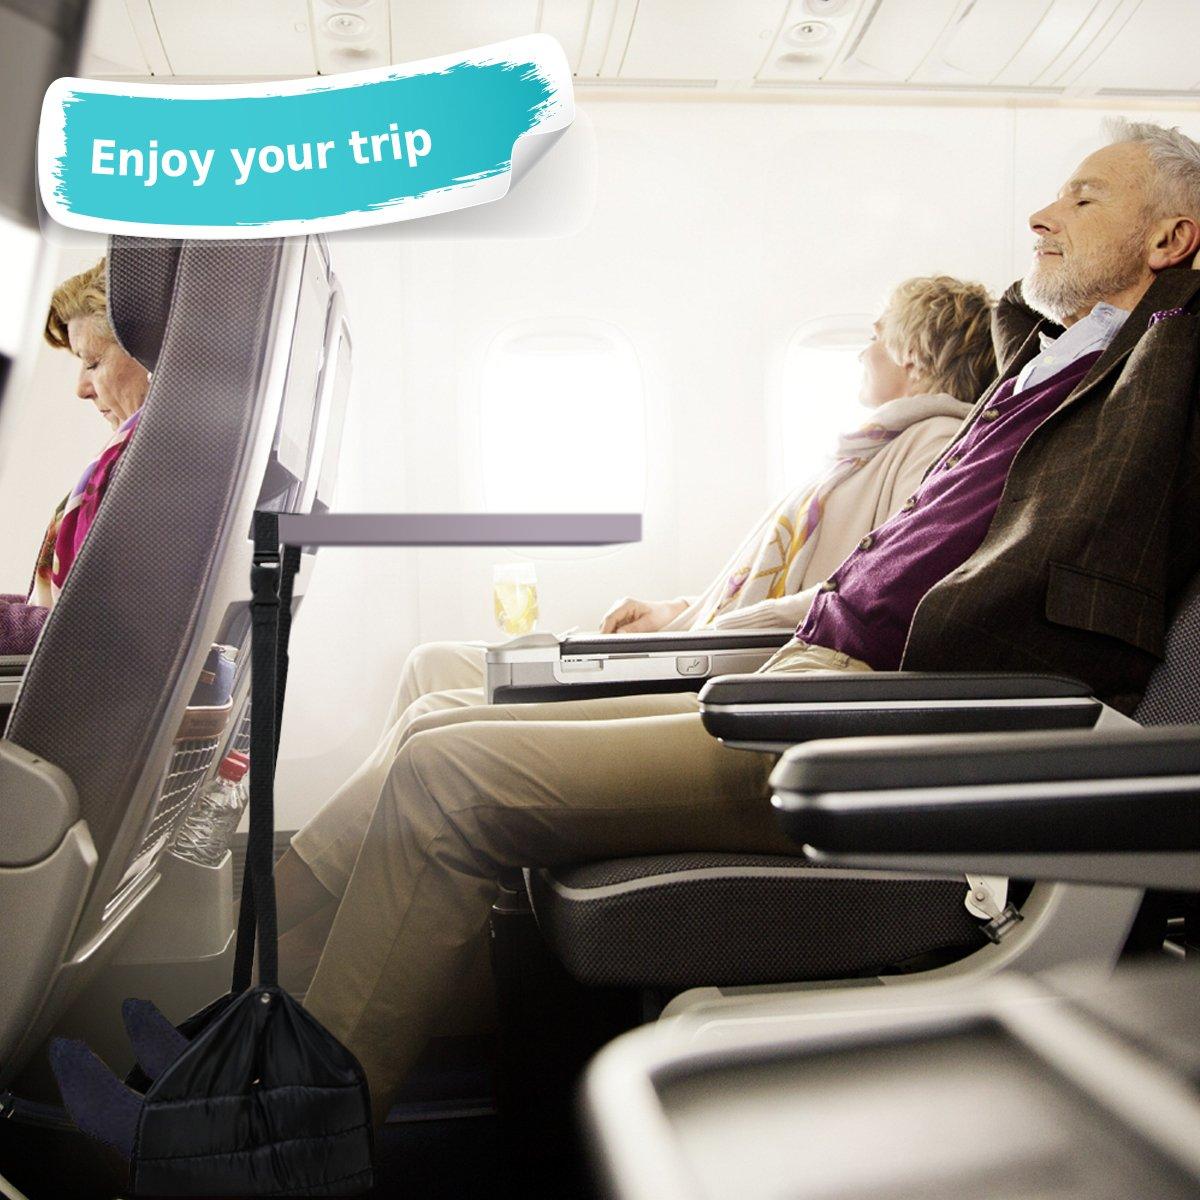 Magift Travel Footrest For Airplane, Portable Foot Rest Flight Foot Rest Hammock Feet Rest For Plane Desk Office(Black)